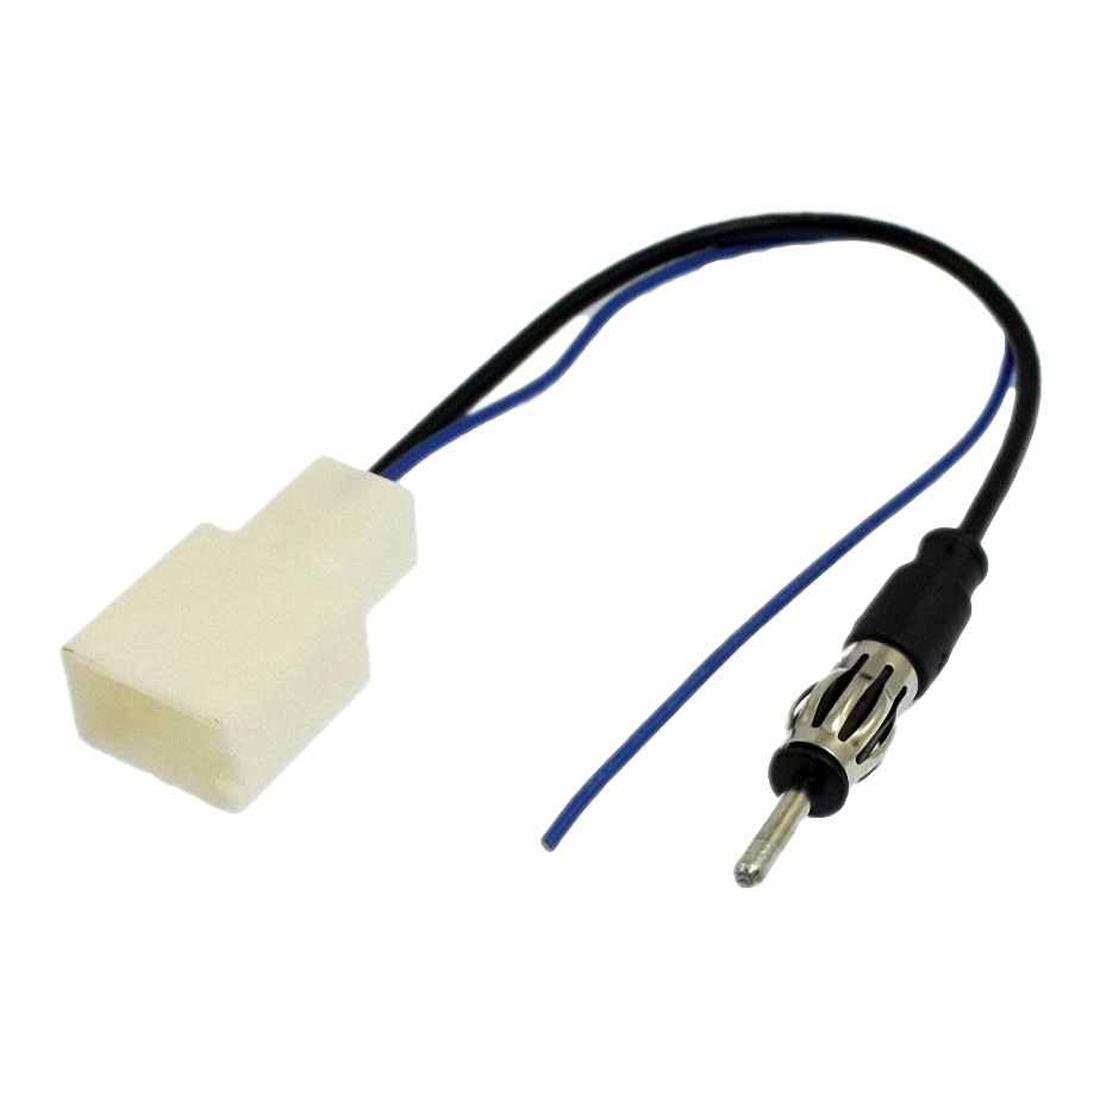 13x o076 car antenna plug to fm radio stereo adapter. Black Bedroom Furniture Sets. Home Design Ideas